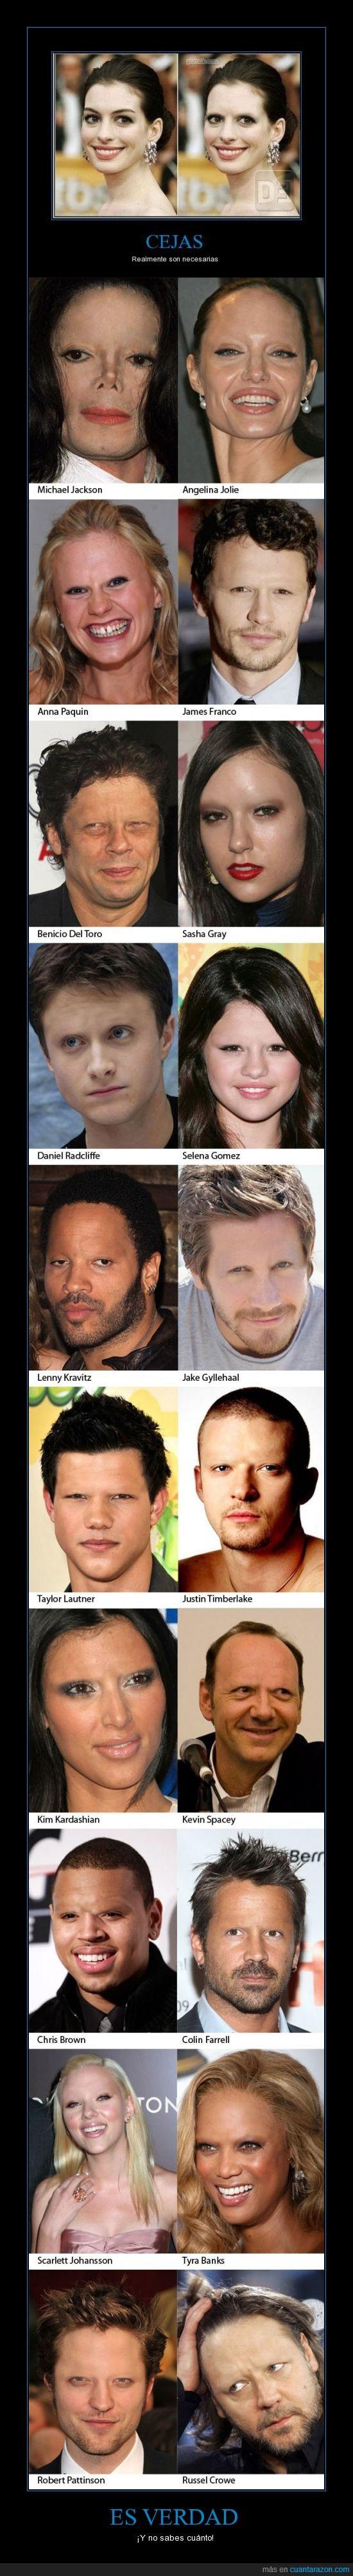 cejas,celebridades,famosos,photoshop